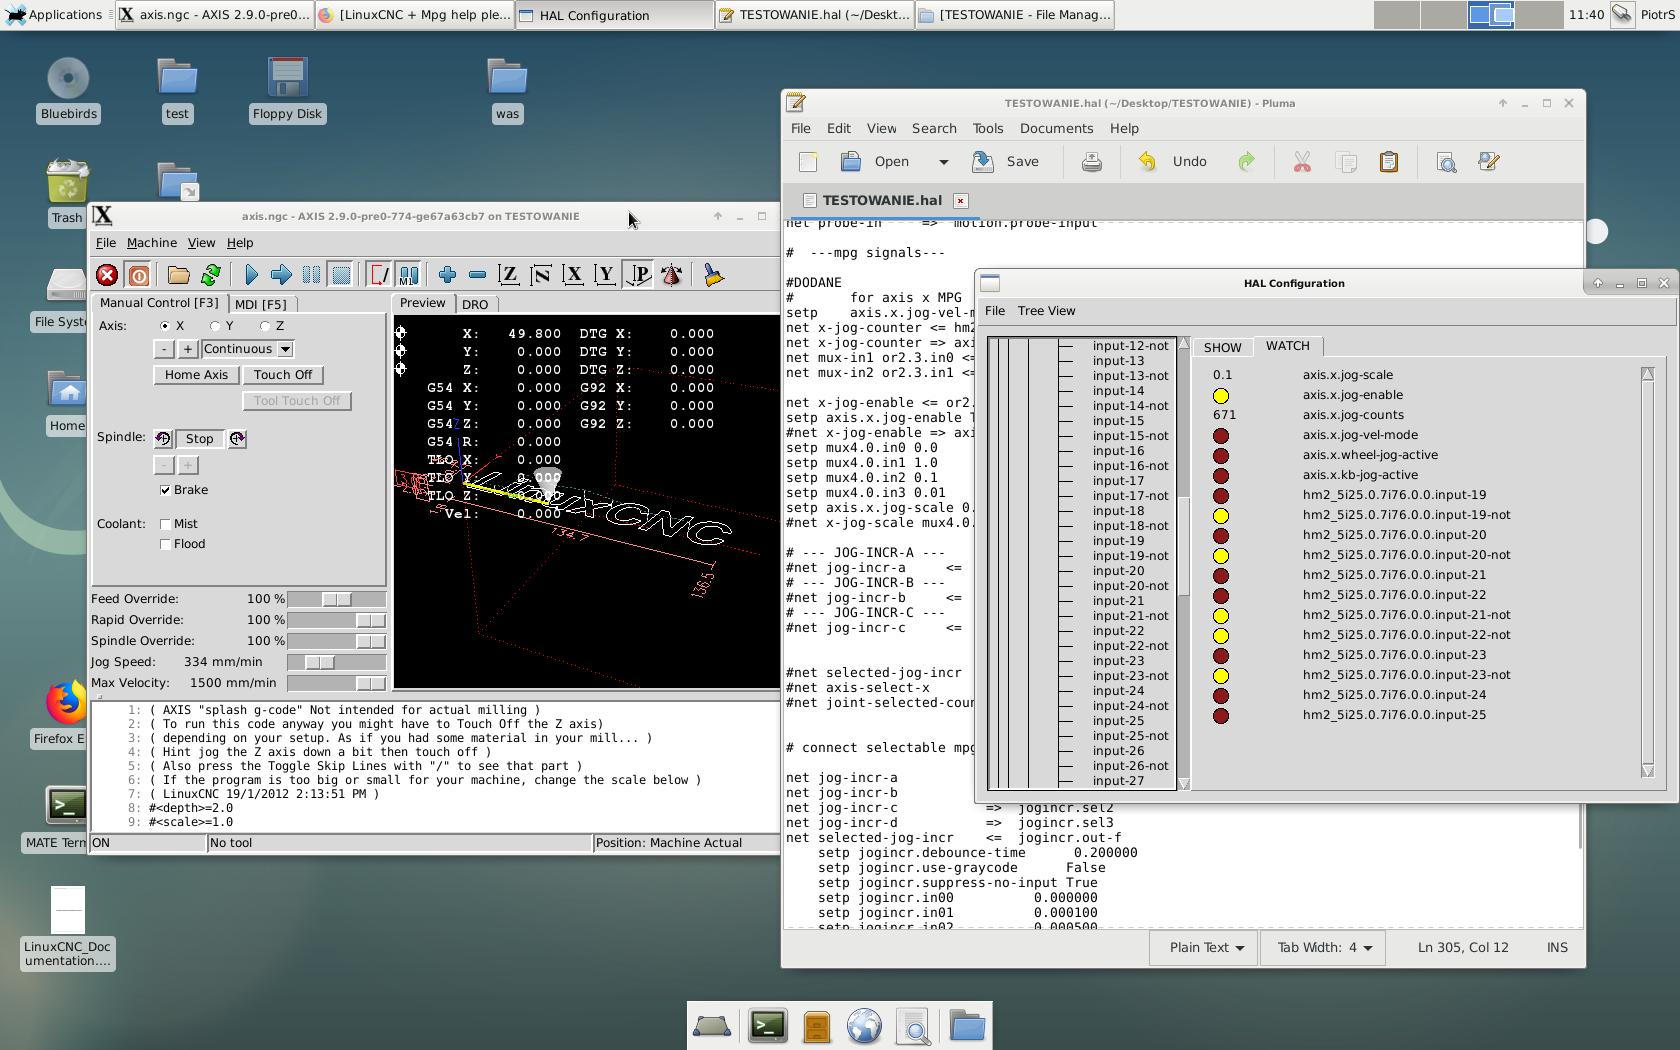 Screenshot_2020-02-04_11-41-02.png